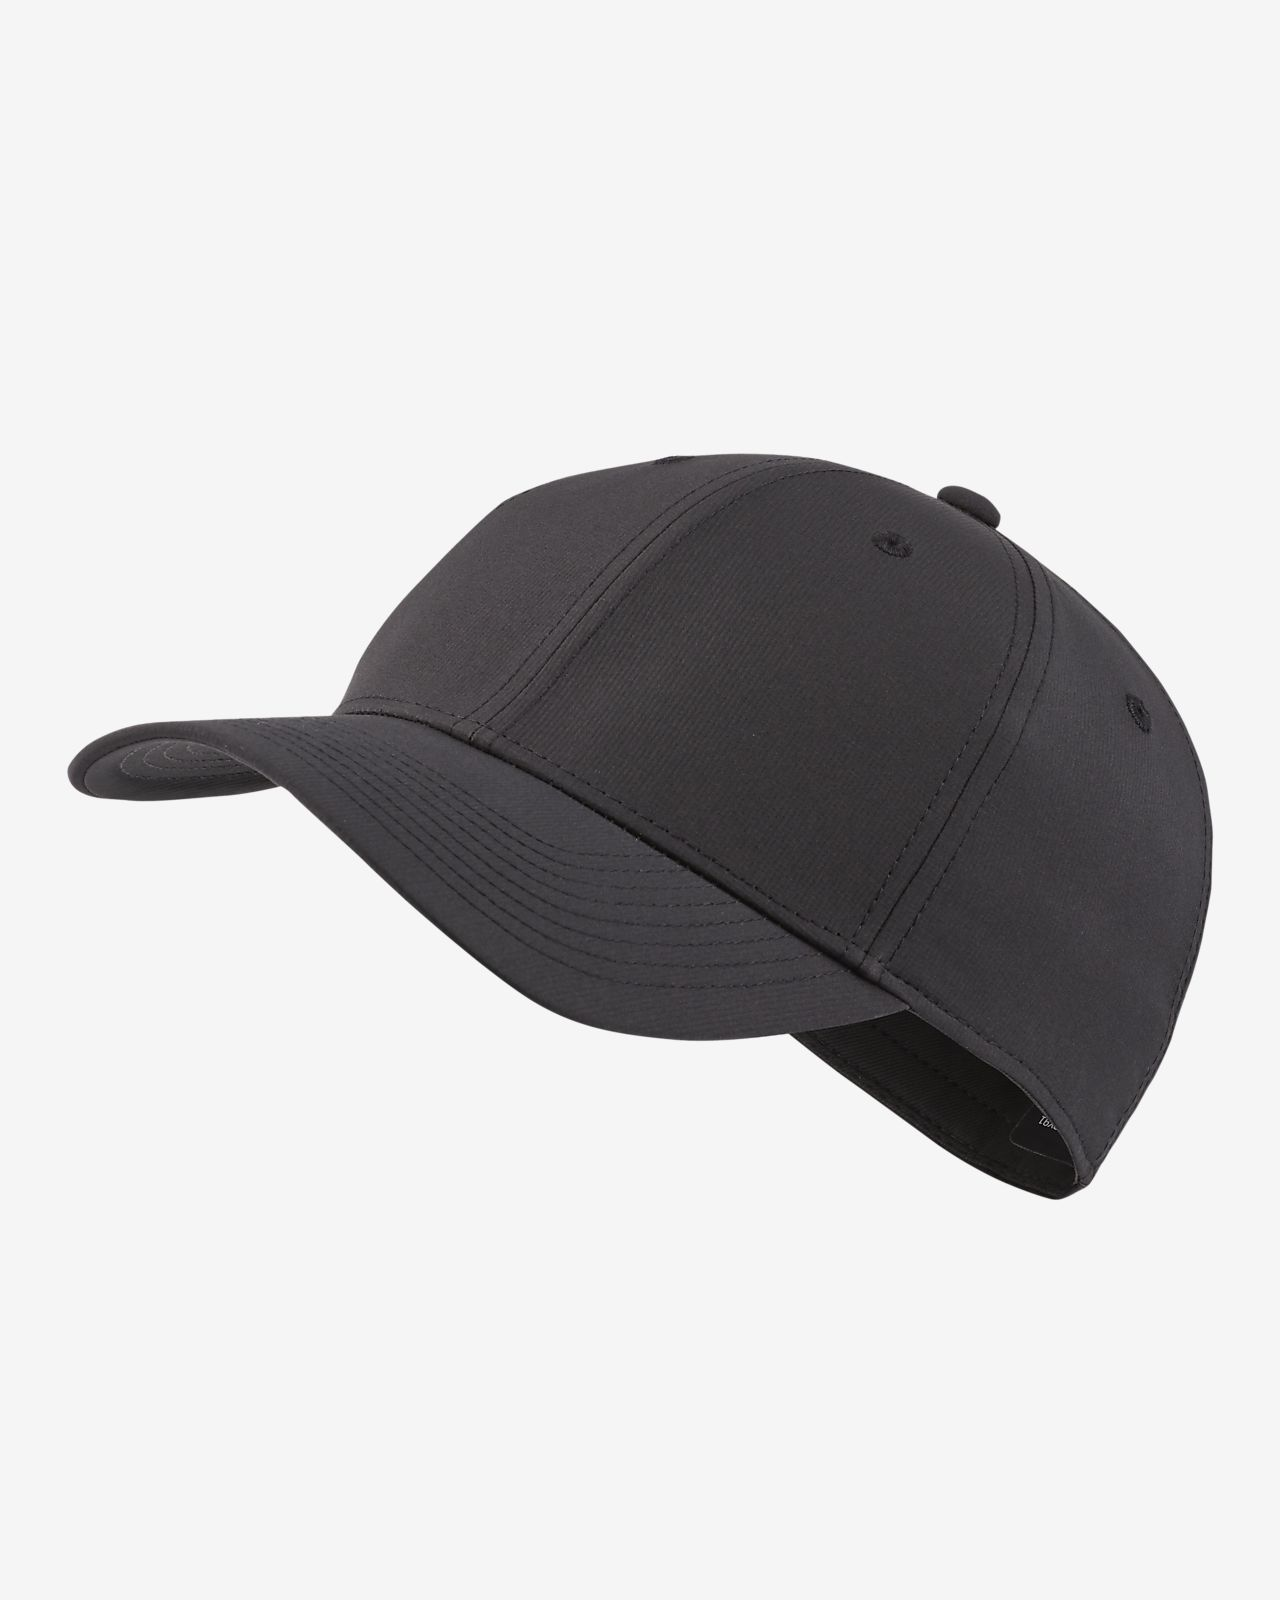 Nike Dri-FIT Legacy91 Golf Hat